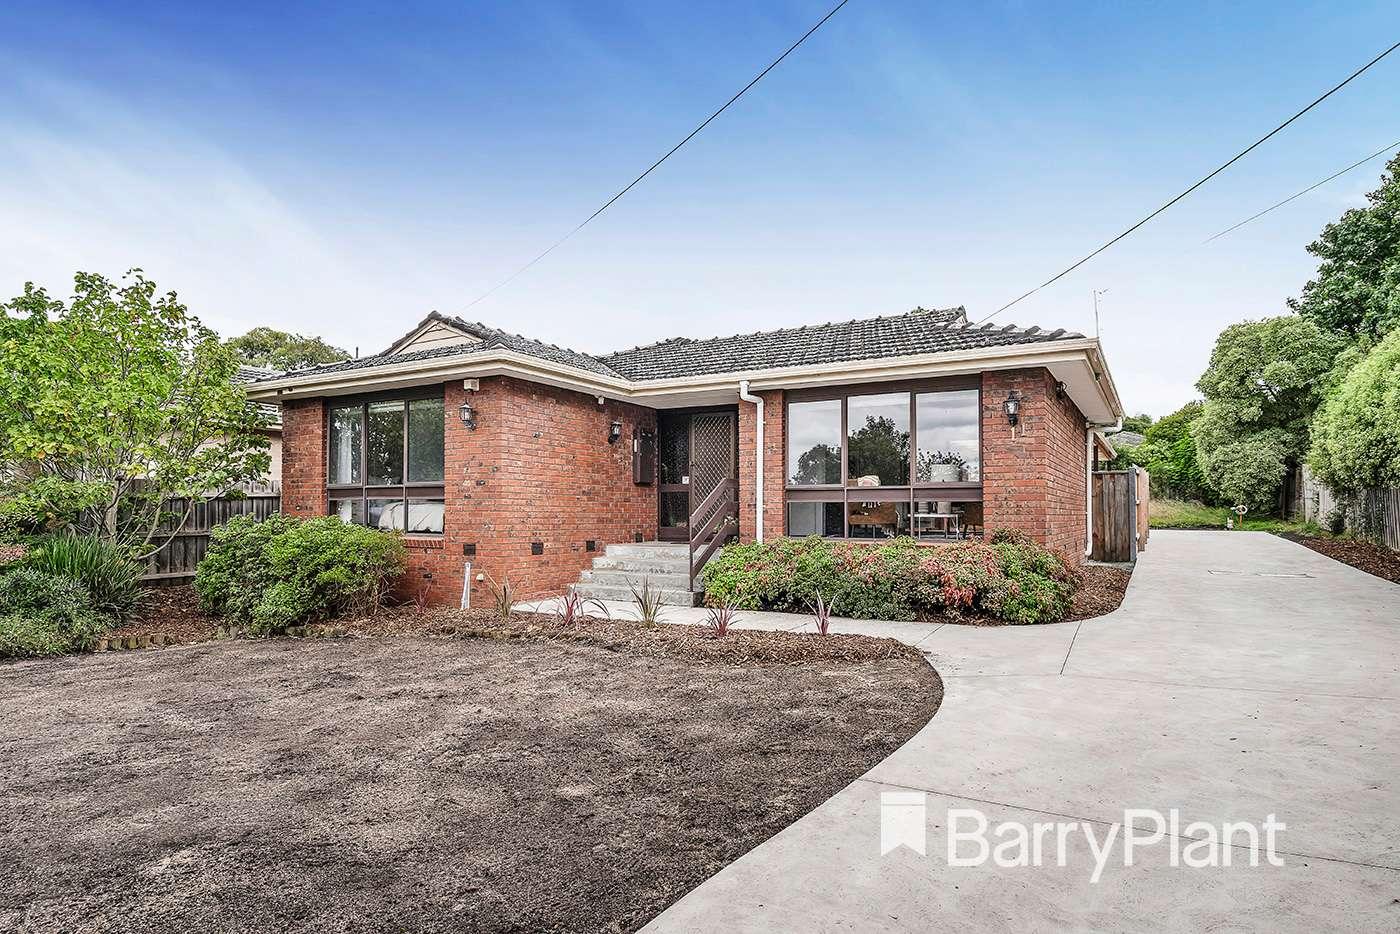 Main view of Homely house listing, 11 Tibarri Court, Mooroolbark VIC 3138